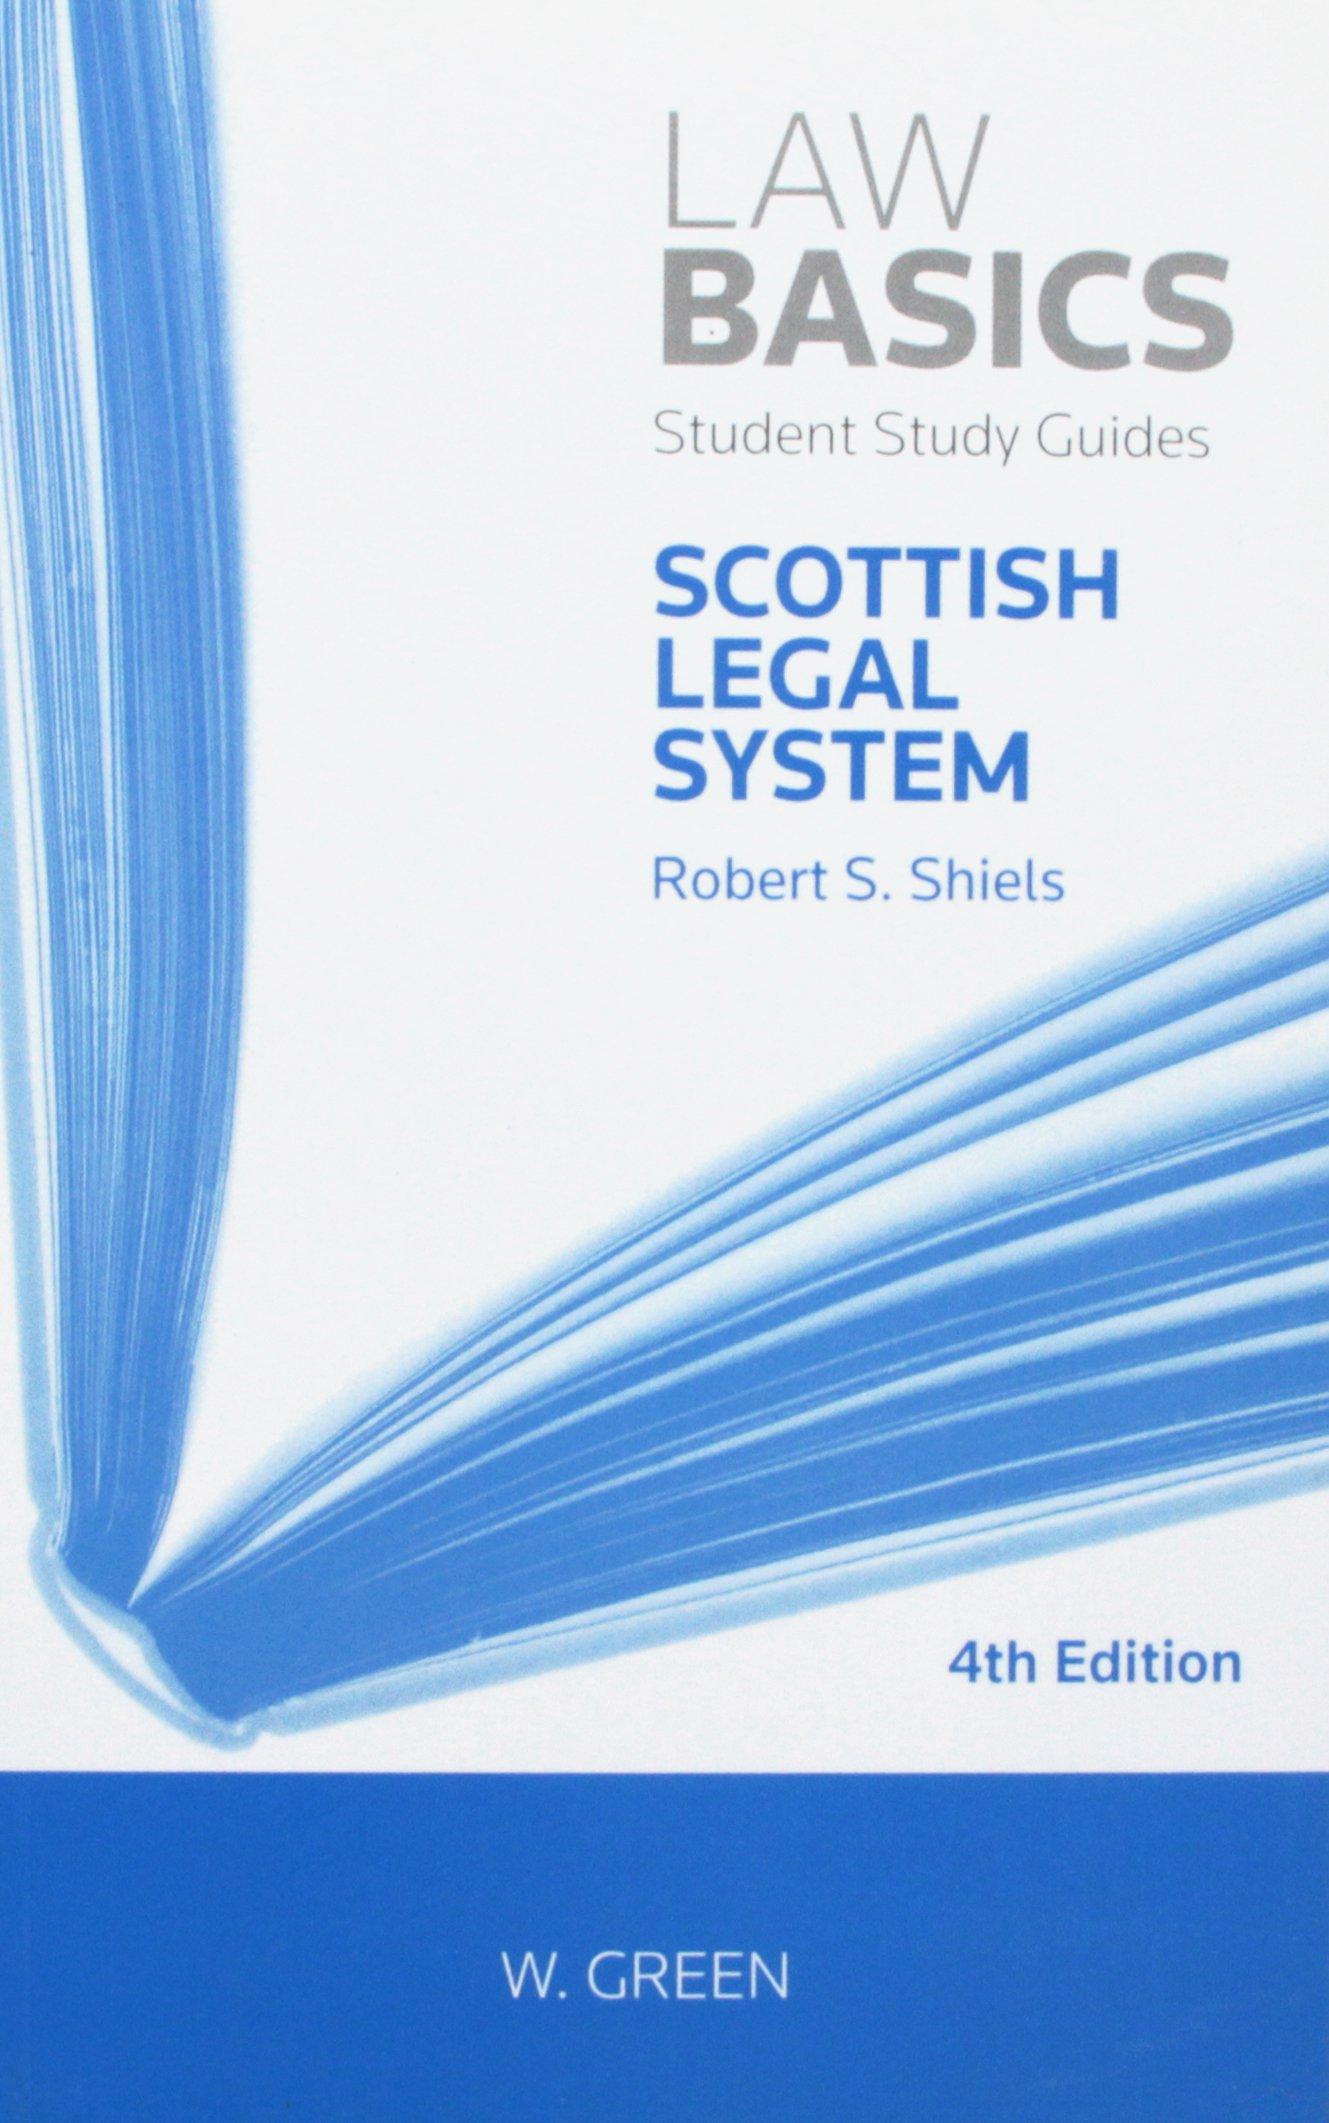 Scottish Legal System LawBasics: Amazon.co.uk: Robert S. Shiels:  9780414032552: Books